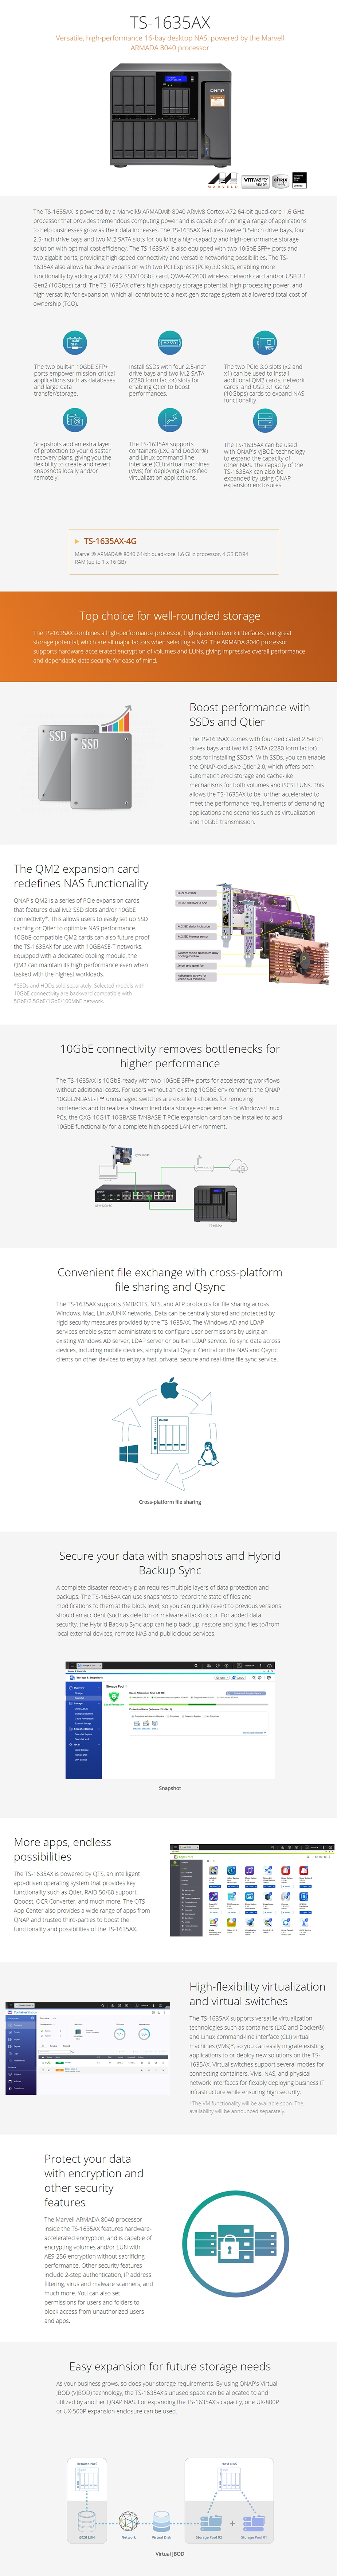 QNAP TS-1635AX-4G 16 Bay Diskless NAS Quad-Core ARMADA 1.6GHz CPU 4GB RAM - Desktop Overview 1